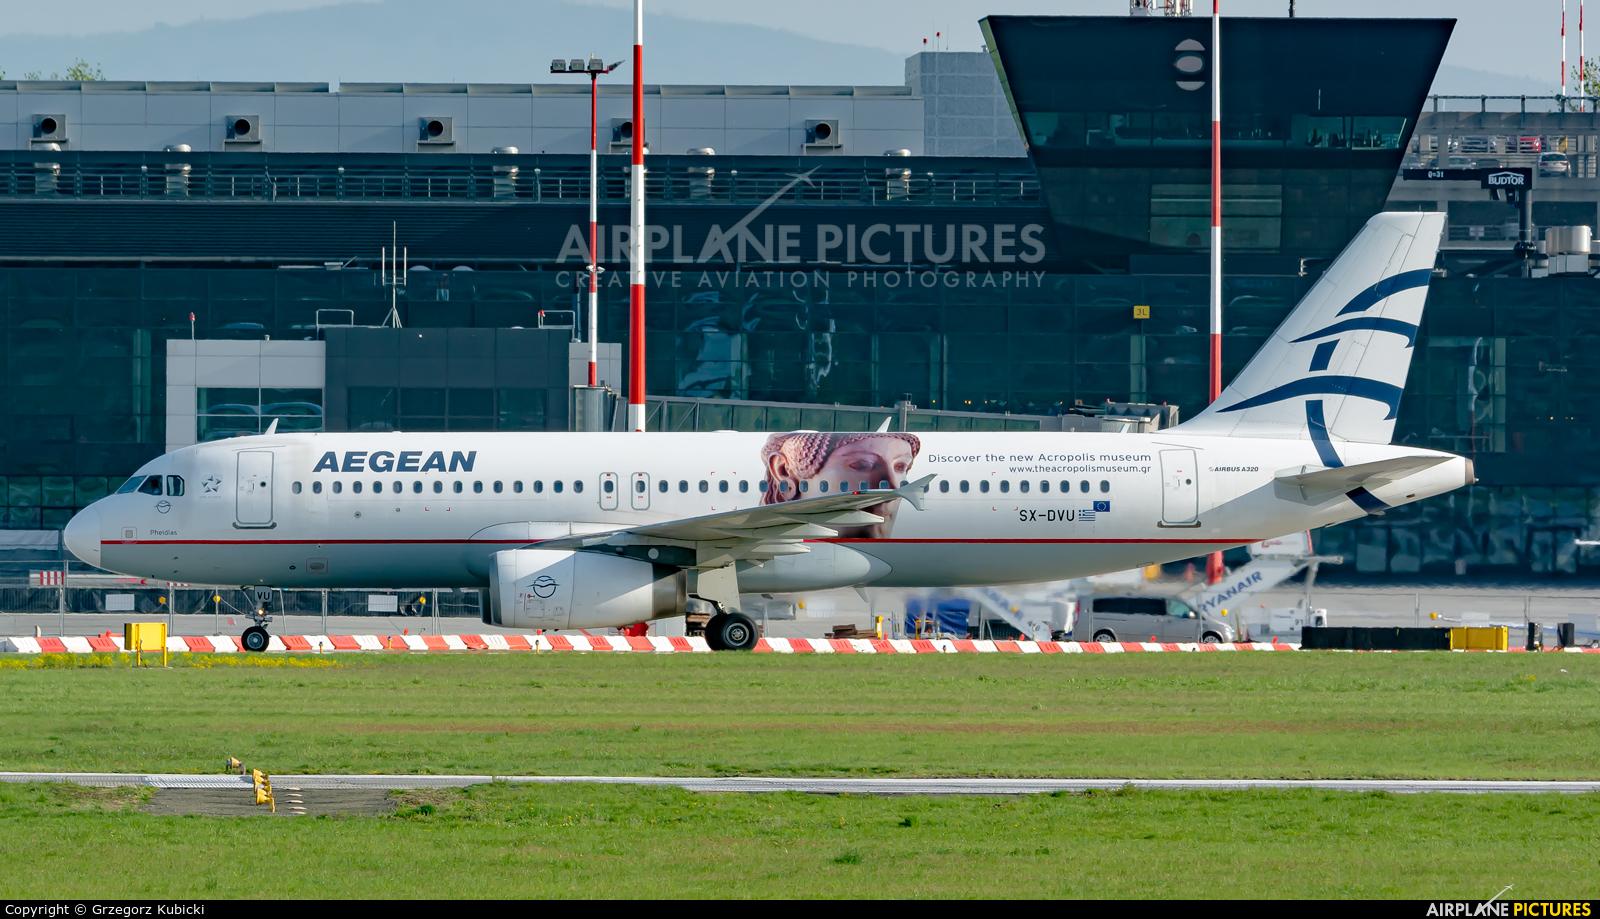 Aegean Airlines SX-DVU aircraft at Kraków - John Paul II Intl